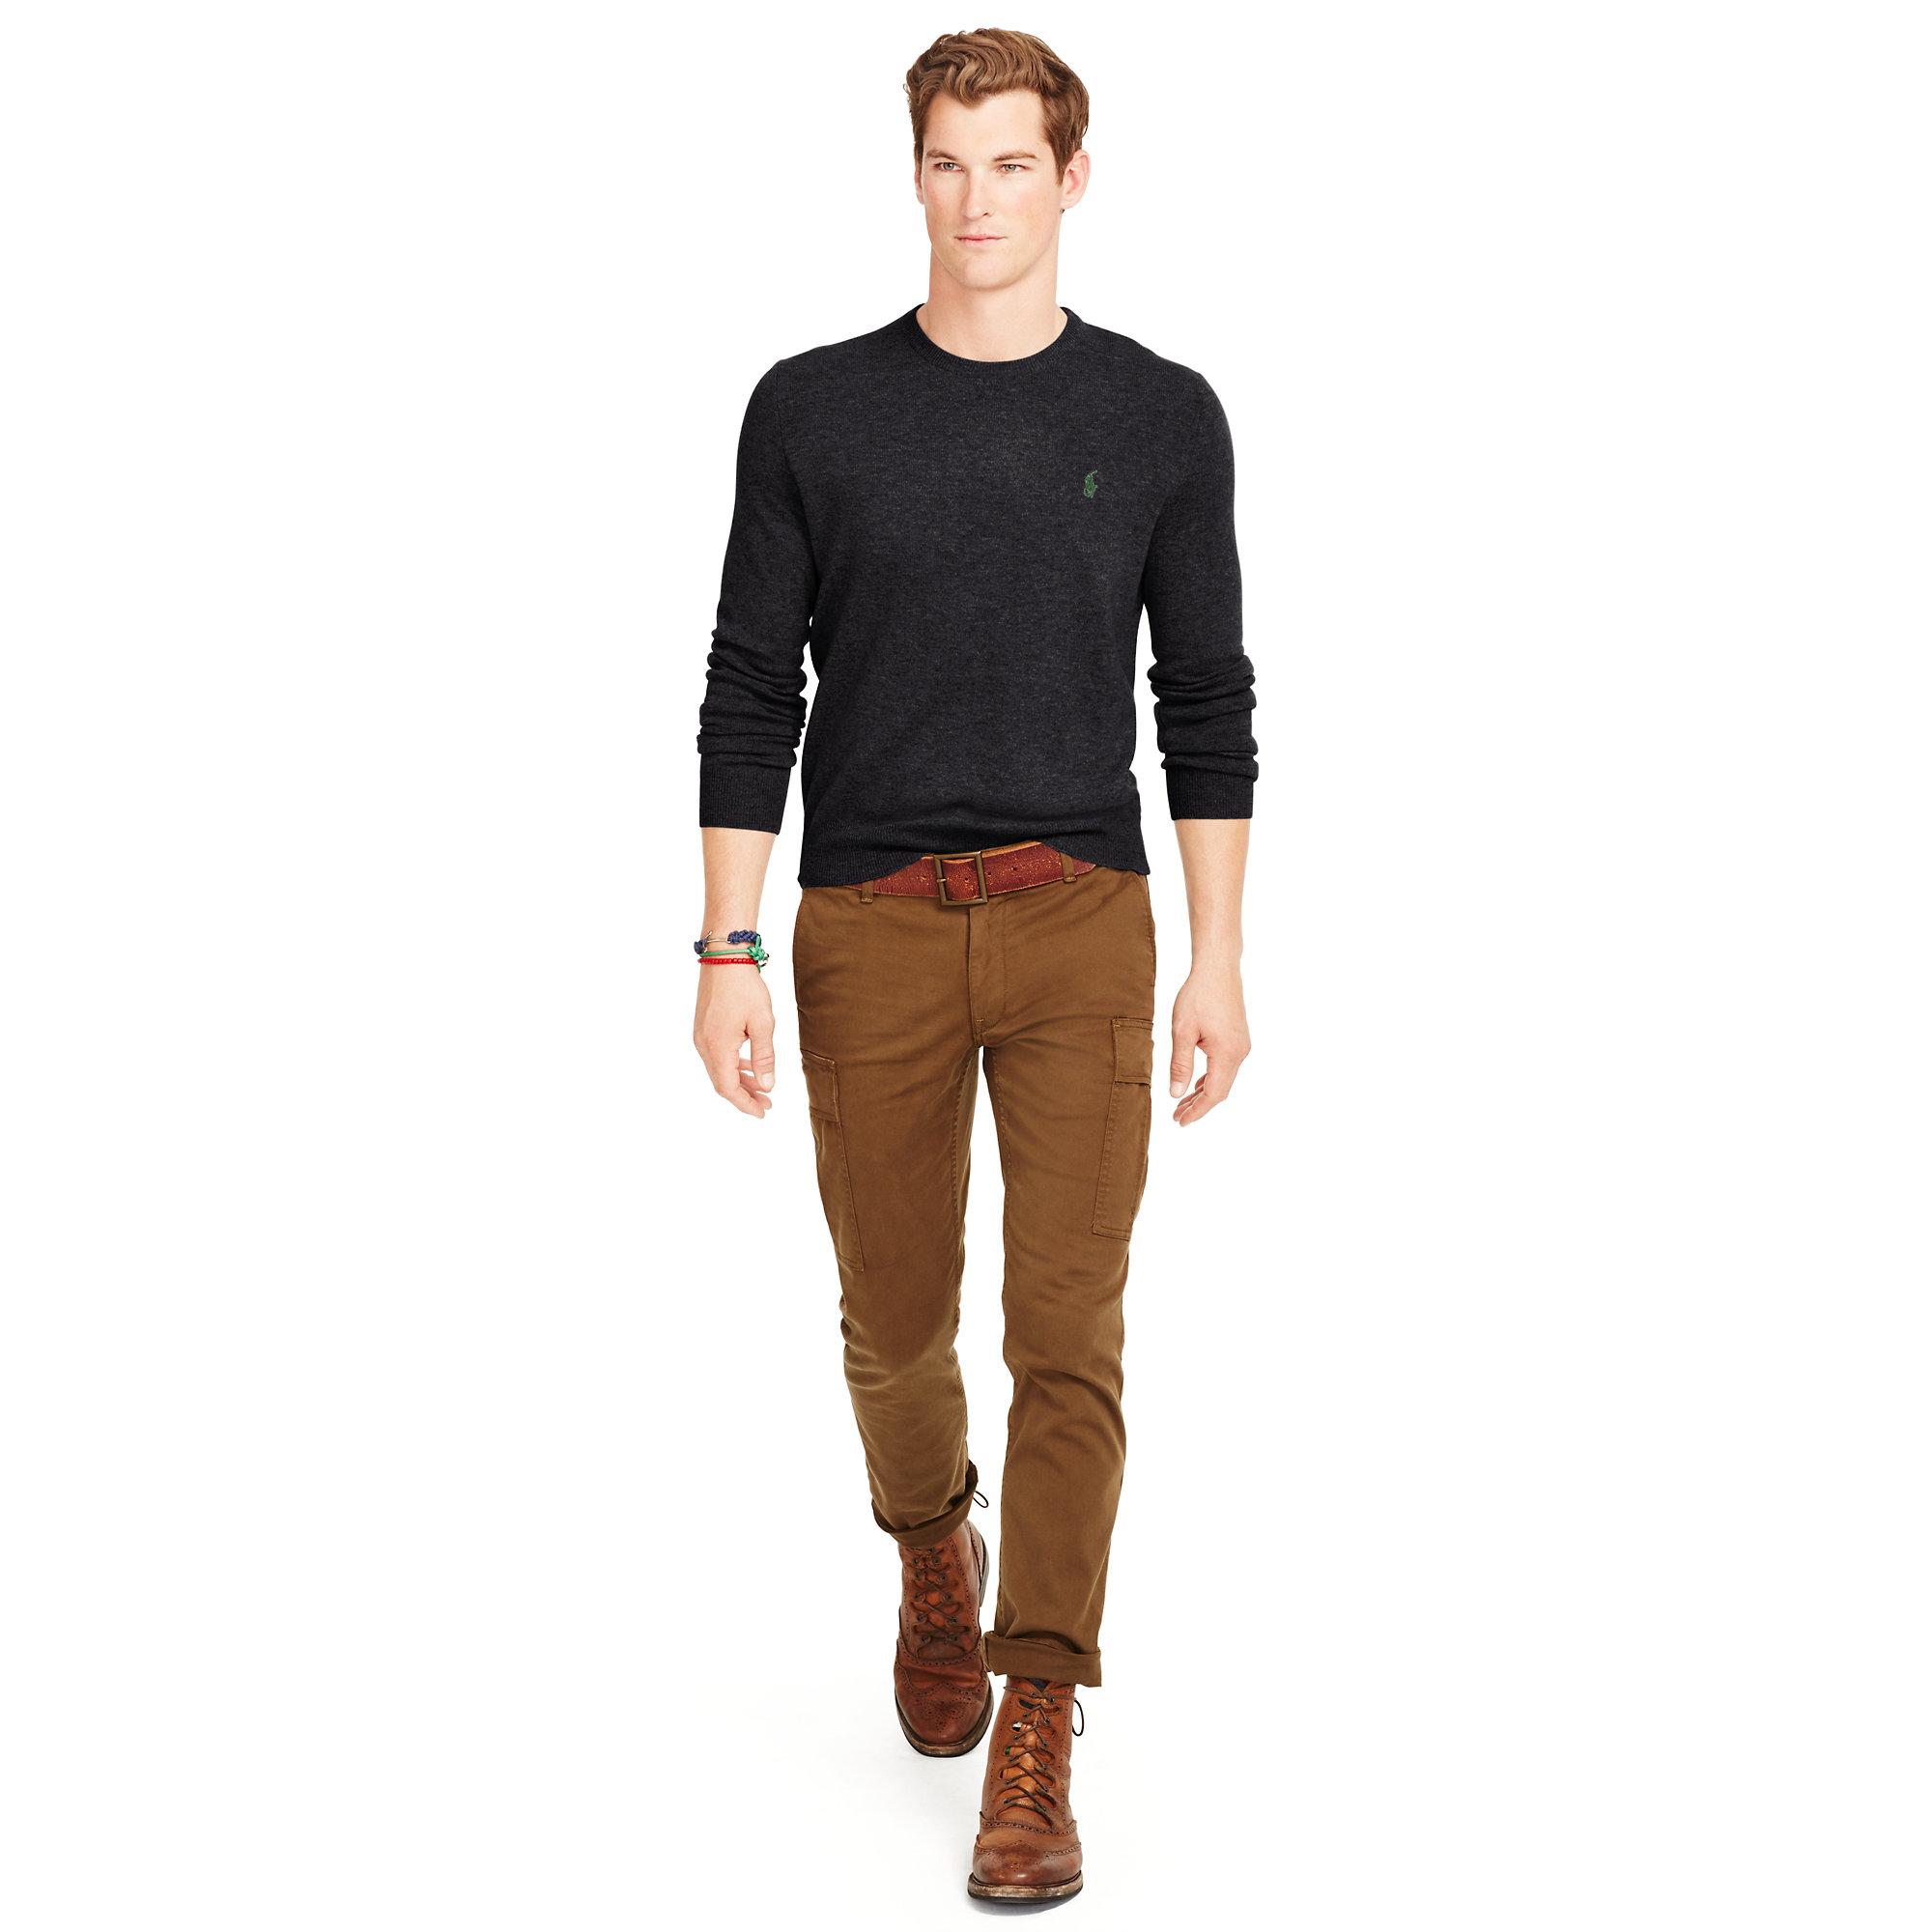 97bdae2dc Lyst - Polo Ralph Lauren Wool Crewneck Sweater in Black for Men